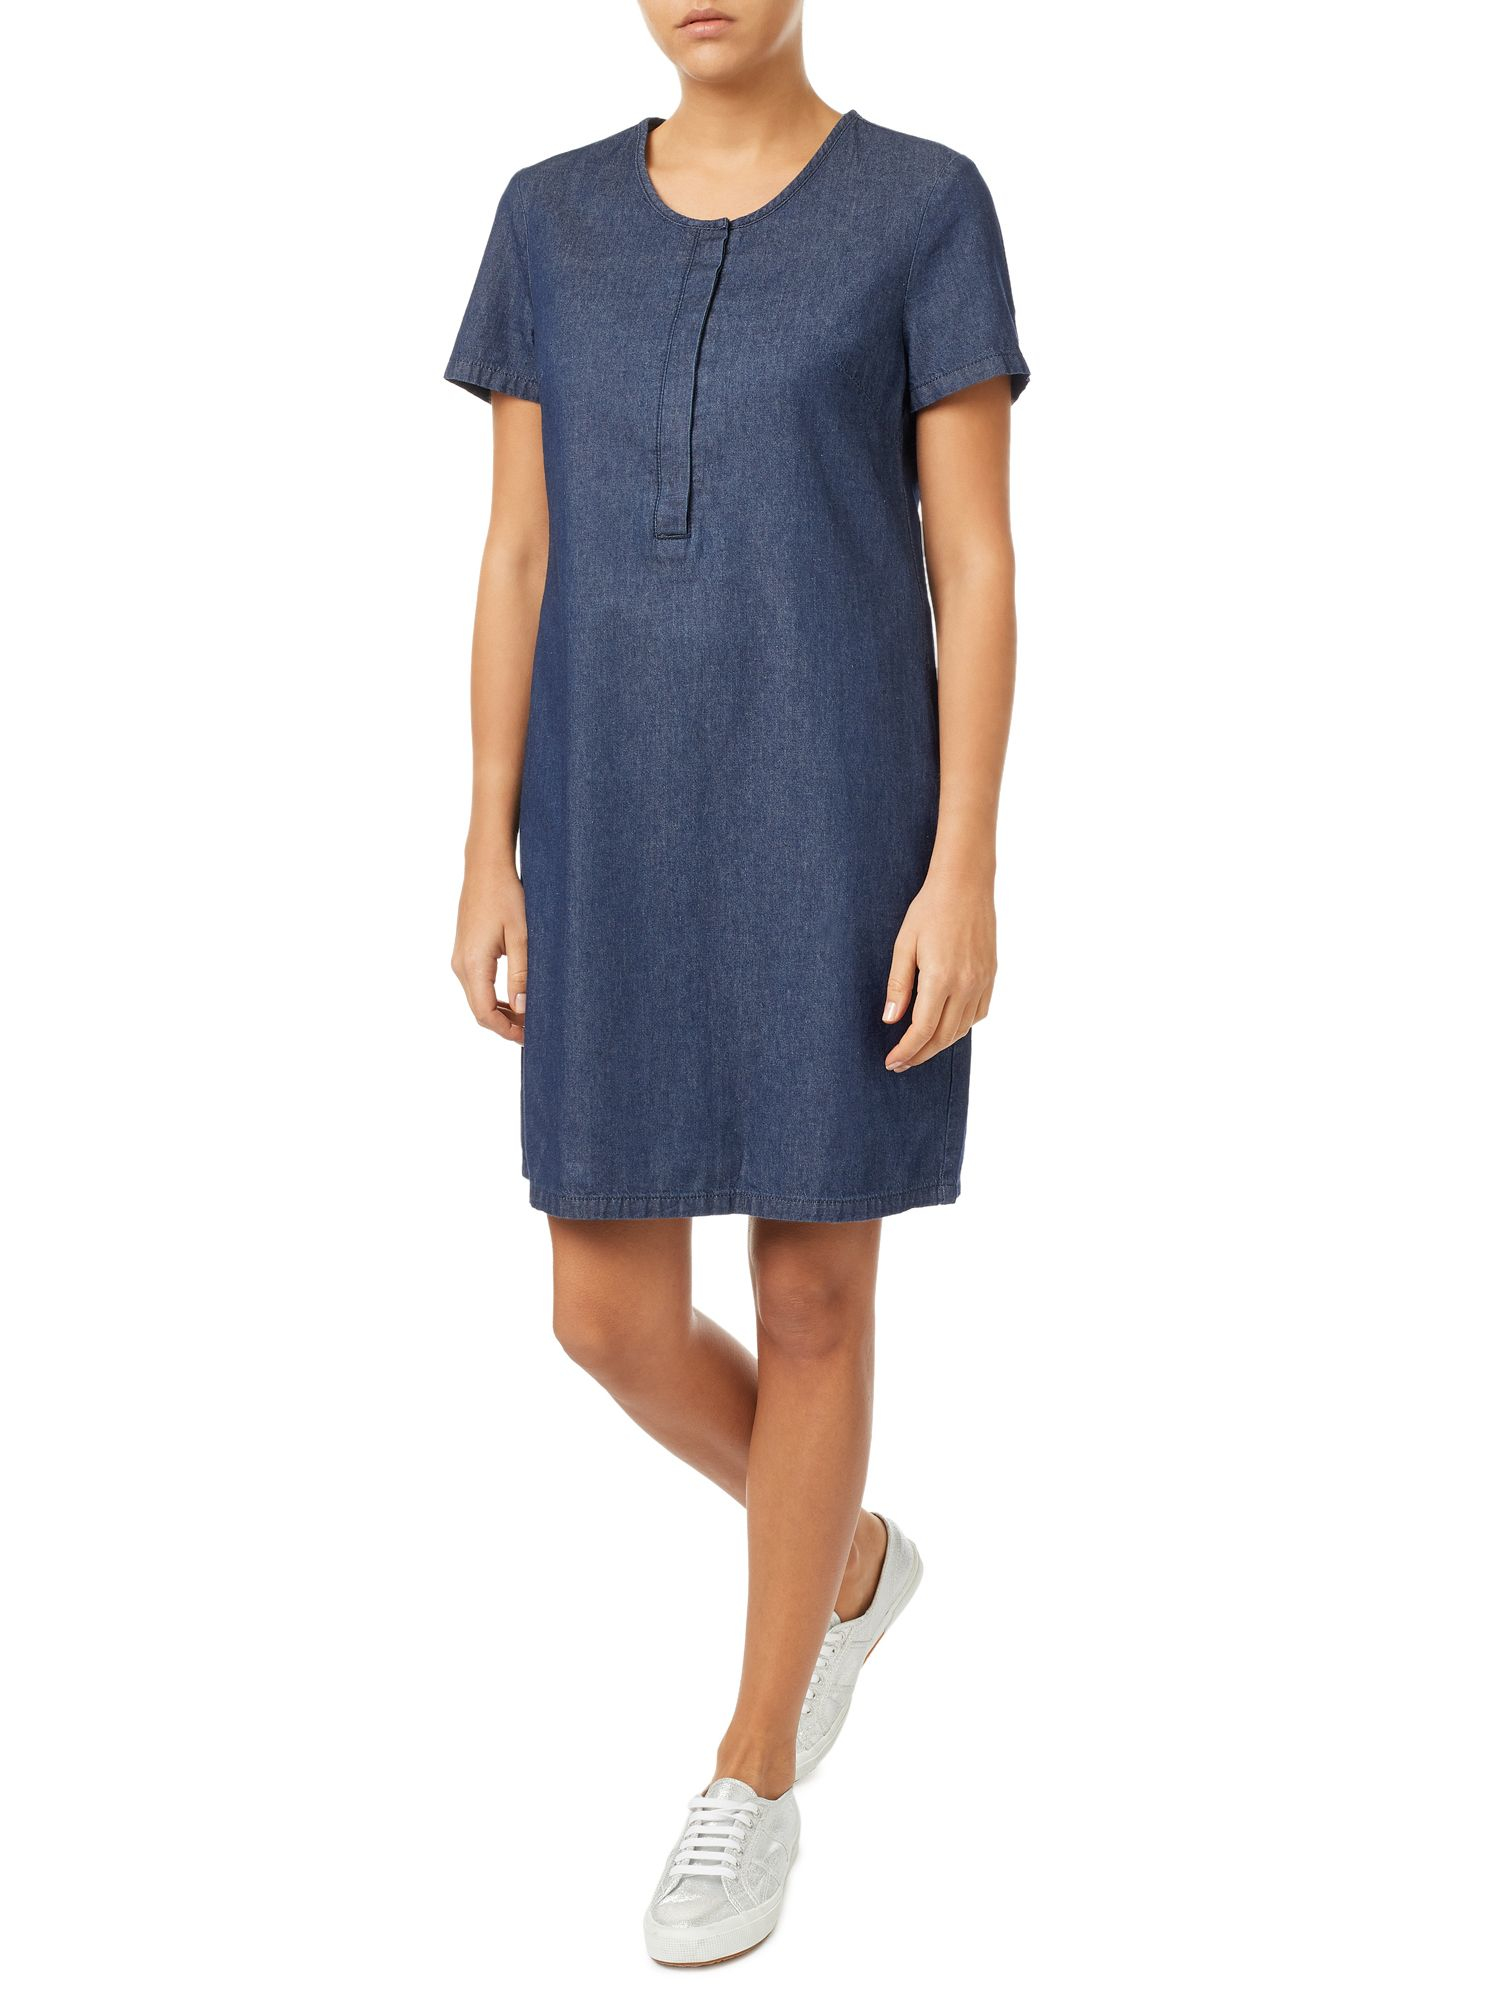 Unique Philosophy Womens Tencel Tunic Roll Tab Sleeve Button Fashion Denim Shirt Dress   EBay